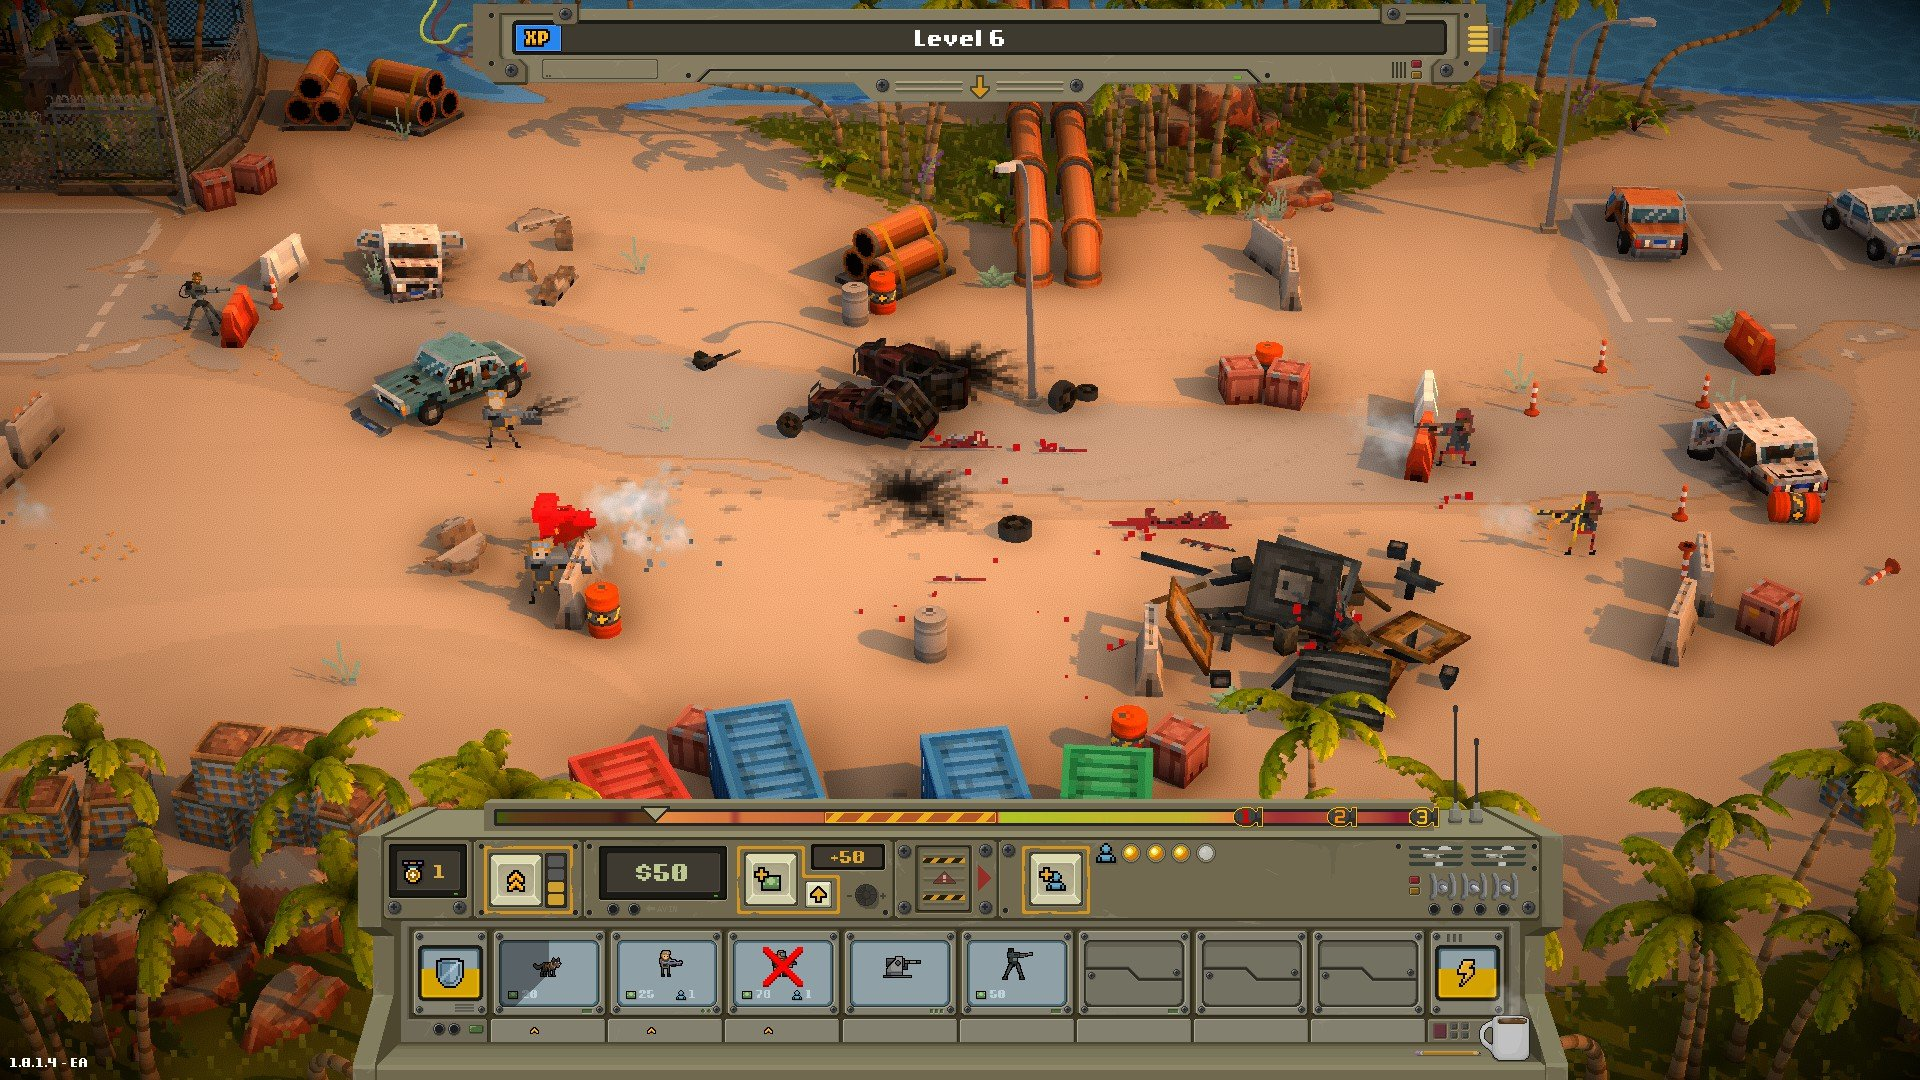 Warpips adds some meta-tension to the usual tug-of-war game screenshot